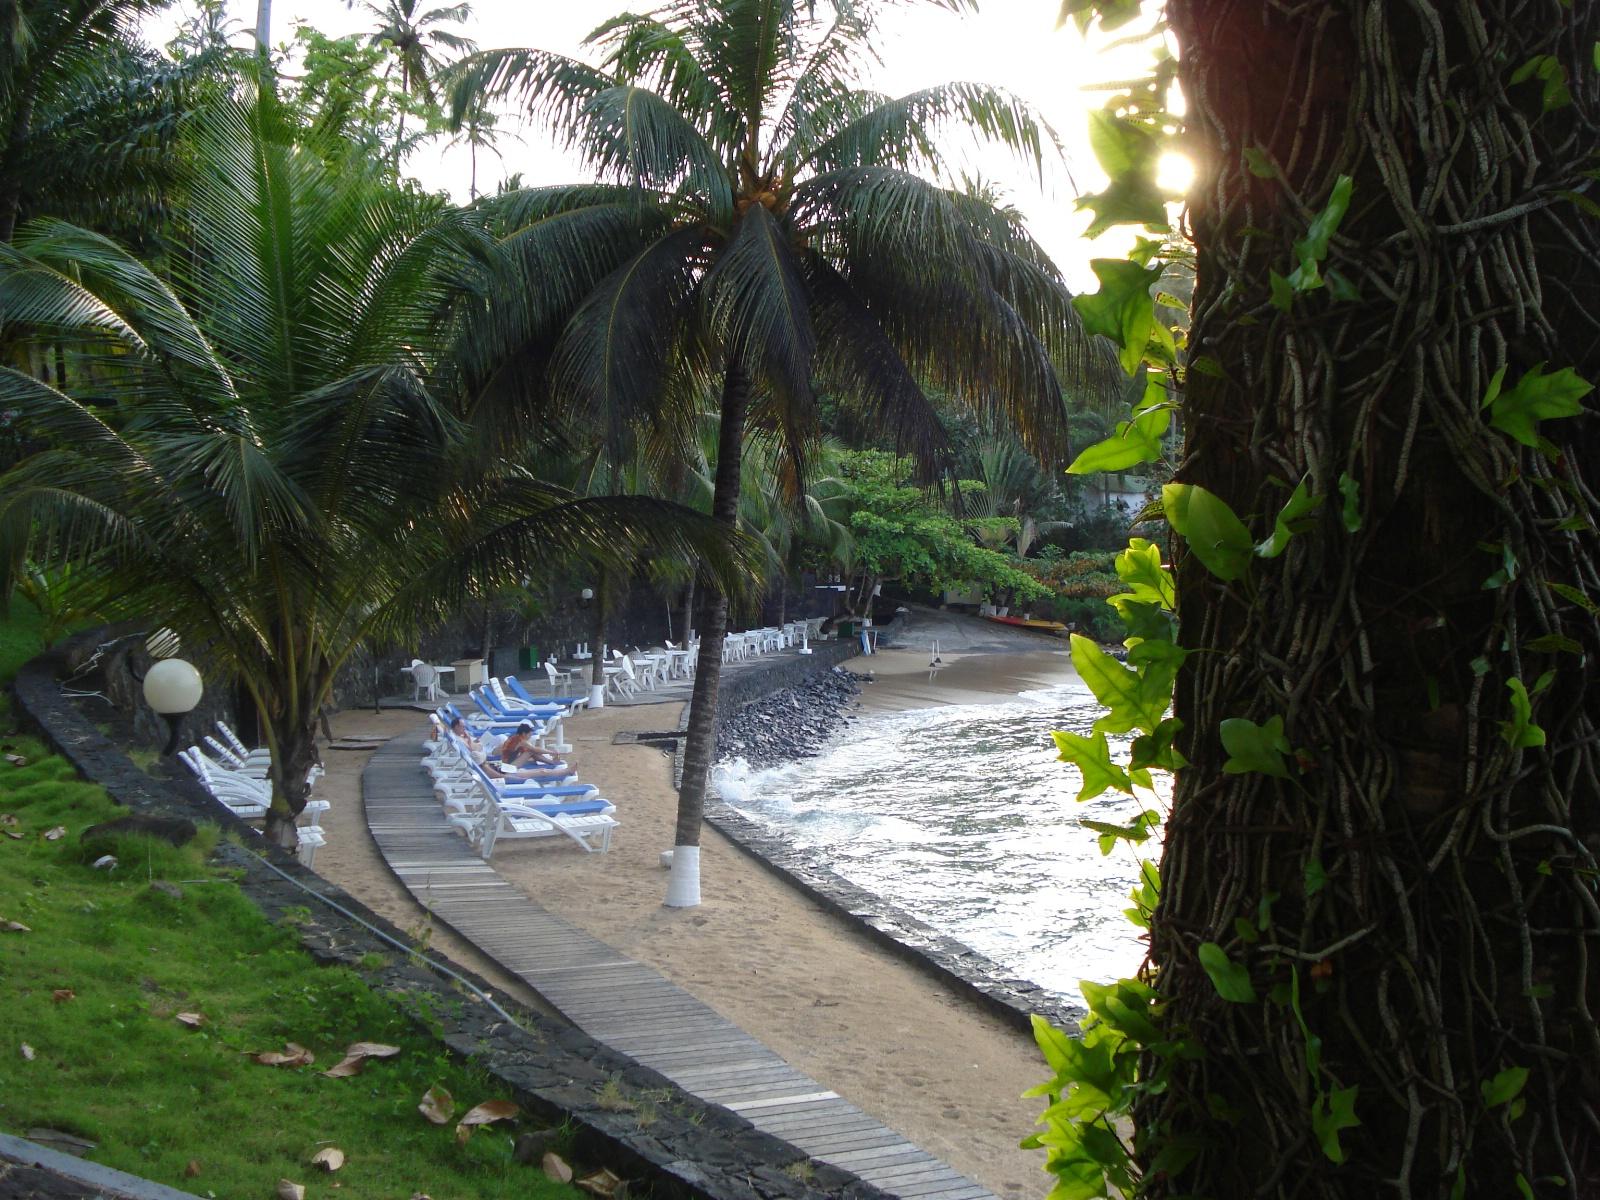 Dersom du ønsker fred og ro, da er Club Santana på Sao Tomé riktig valg